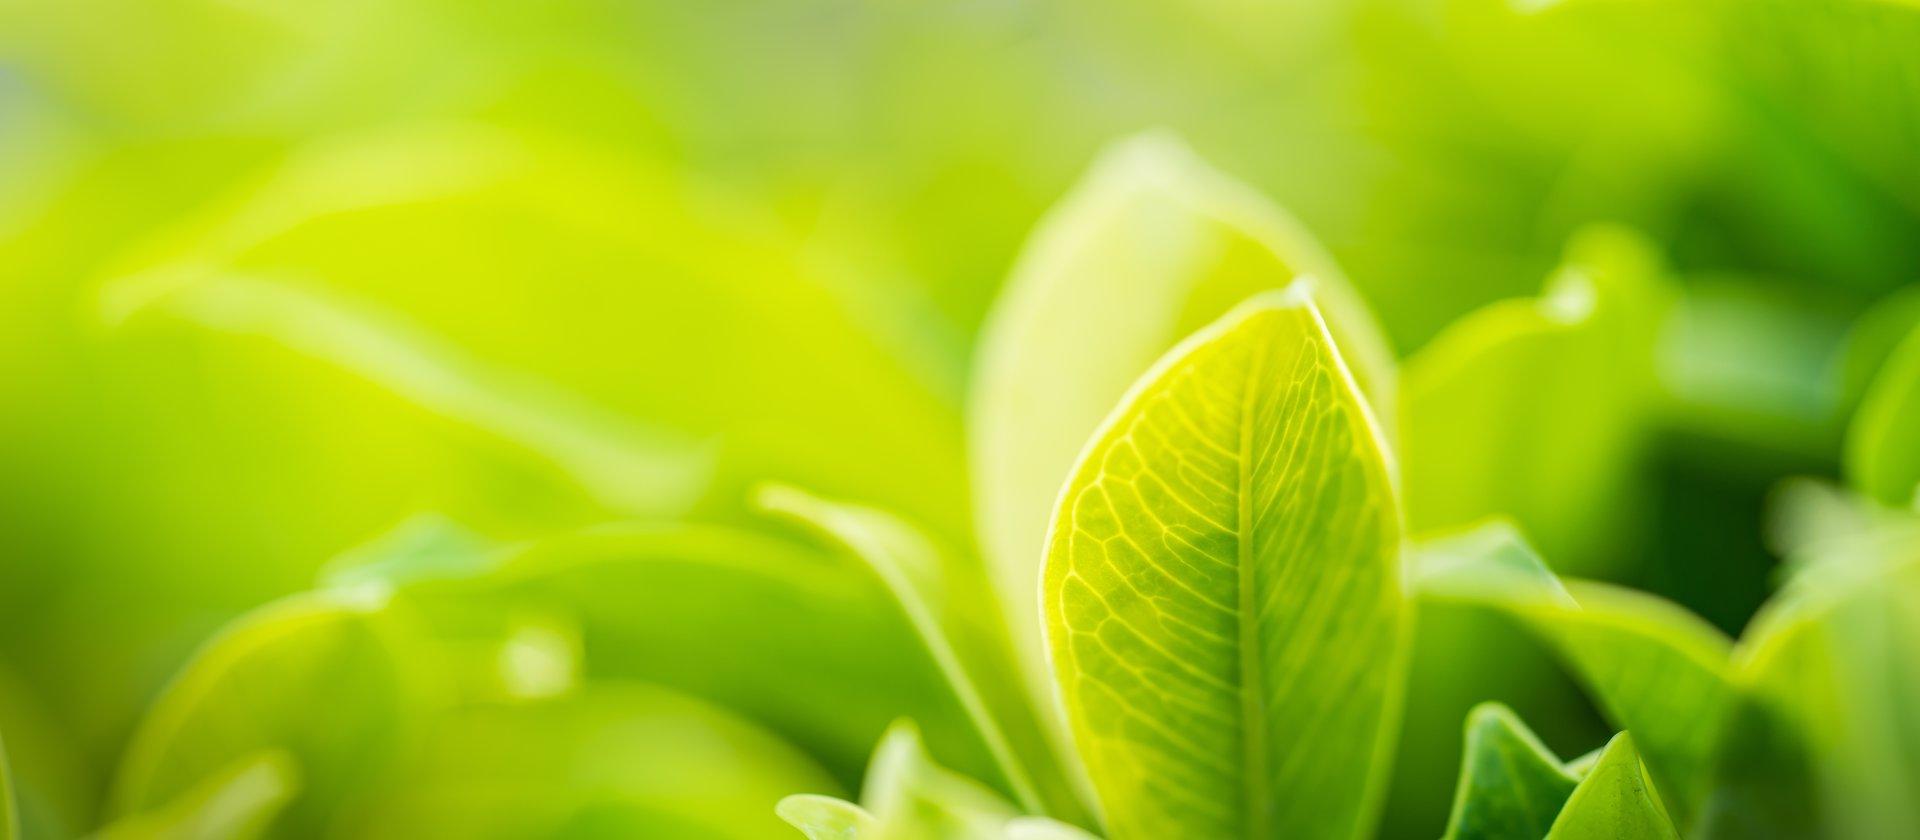 natura foglia verde w